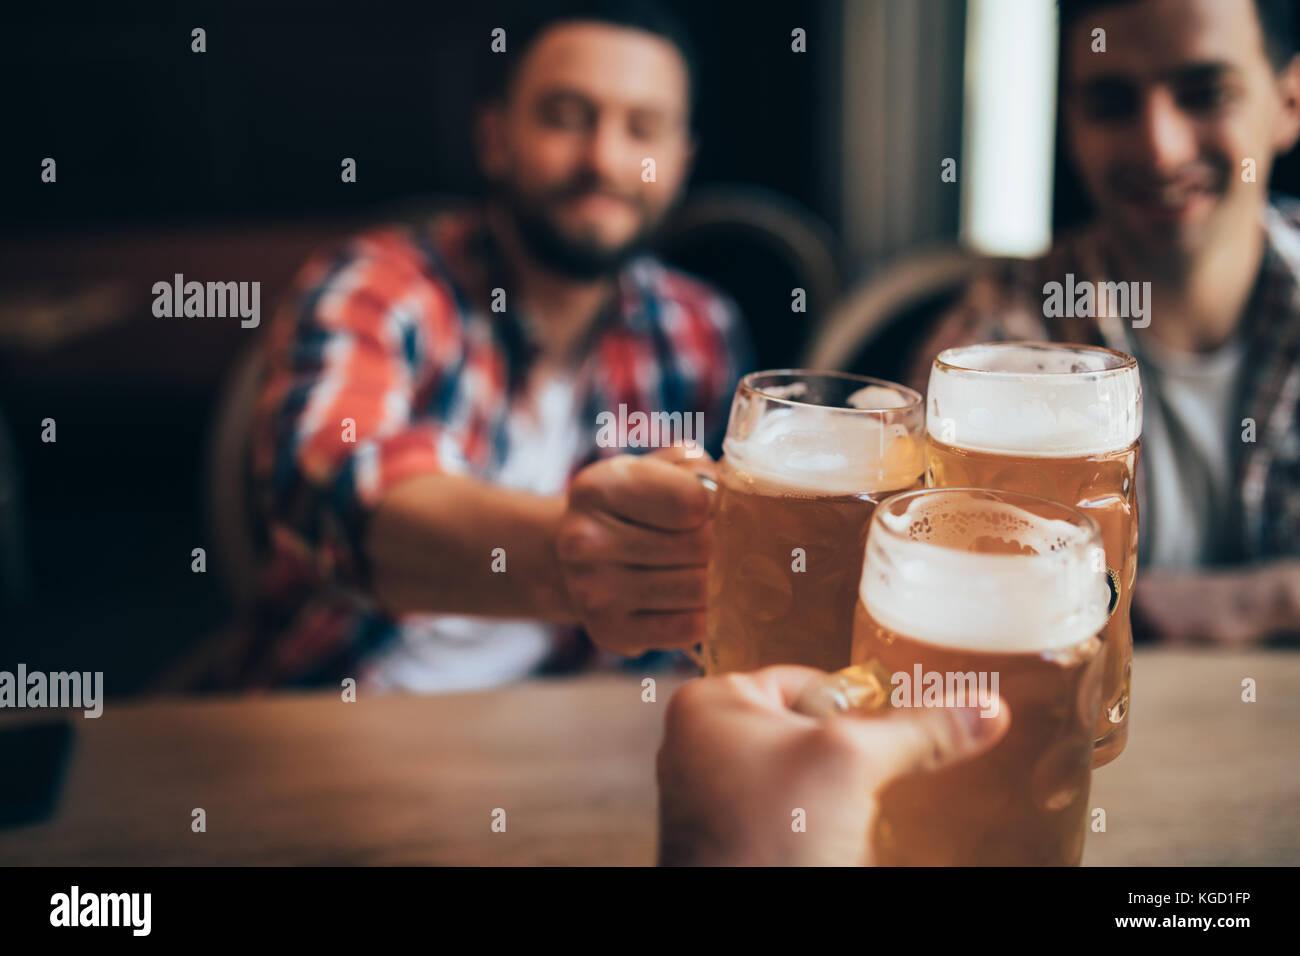 Hands Hold Beverage Beers Bottle Cheers in pub - Stock Image